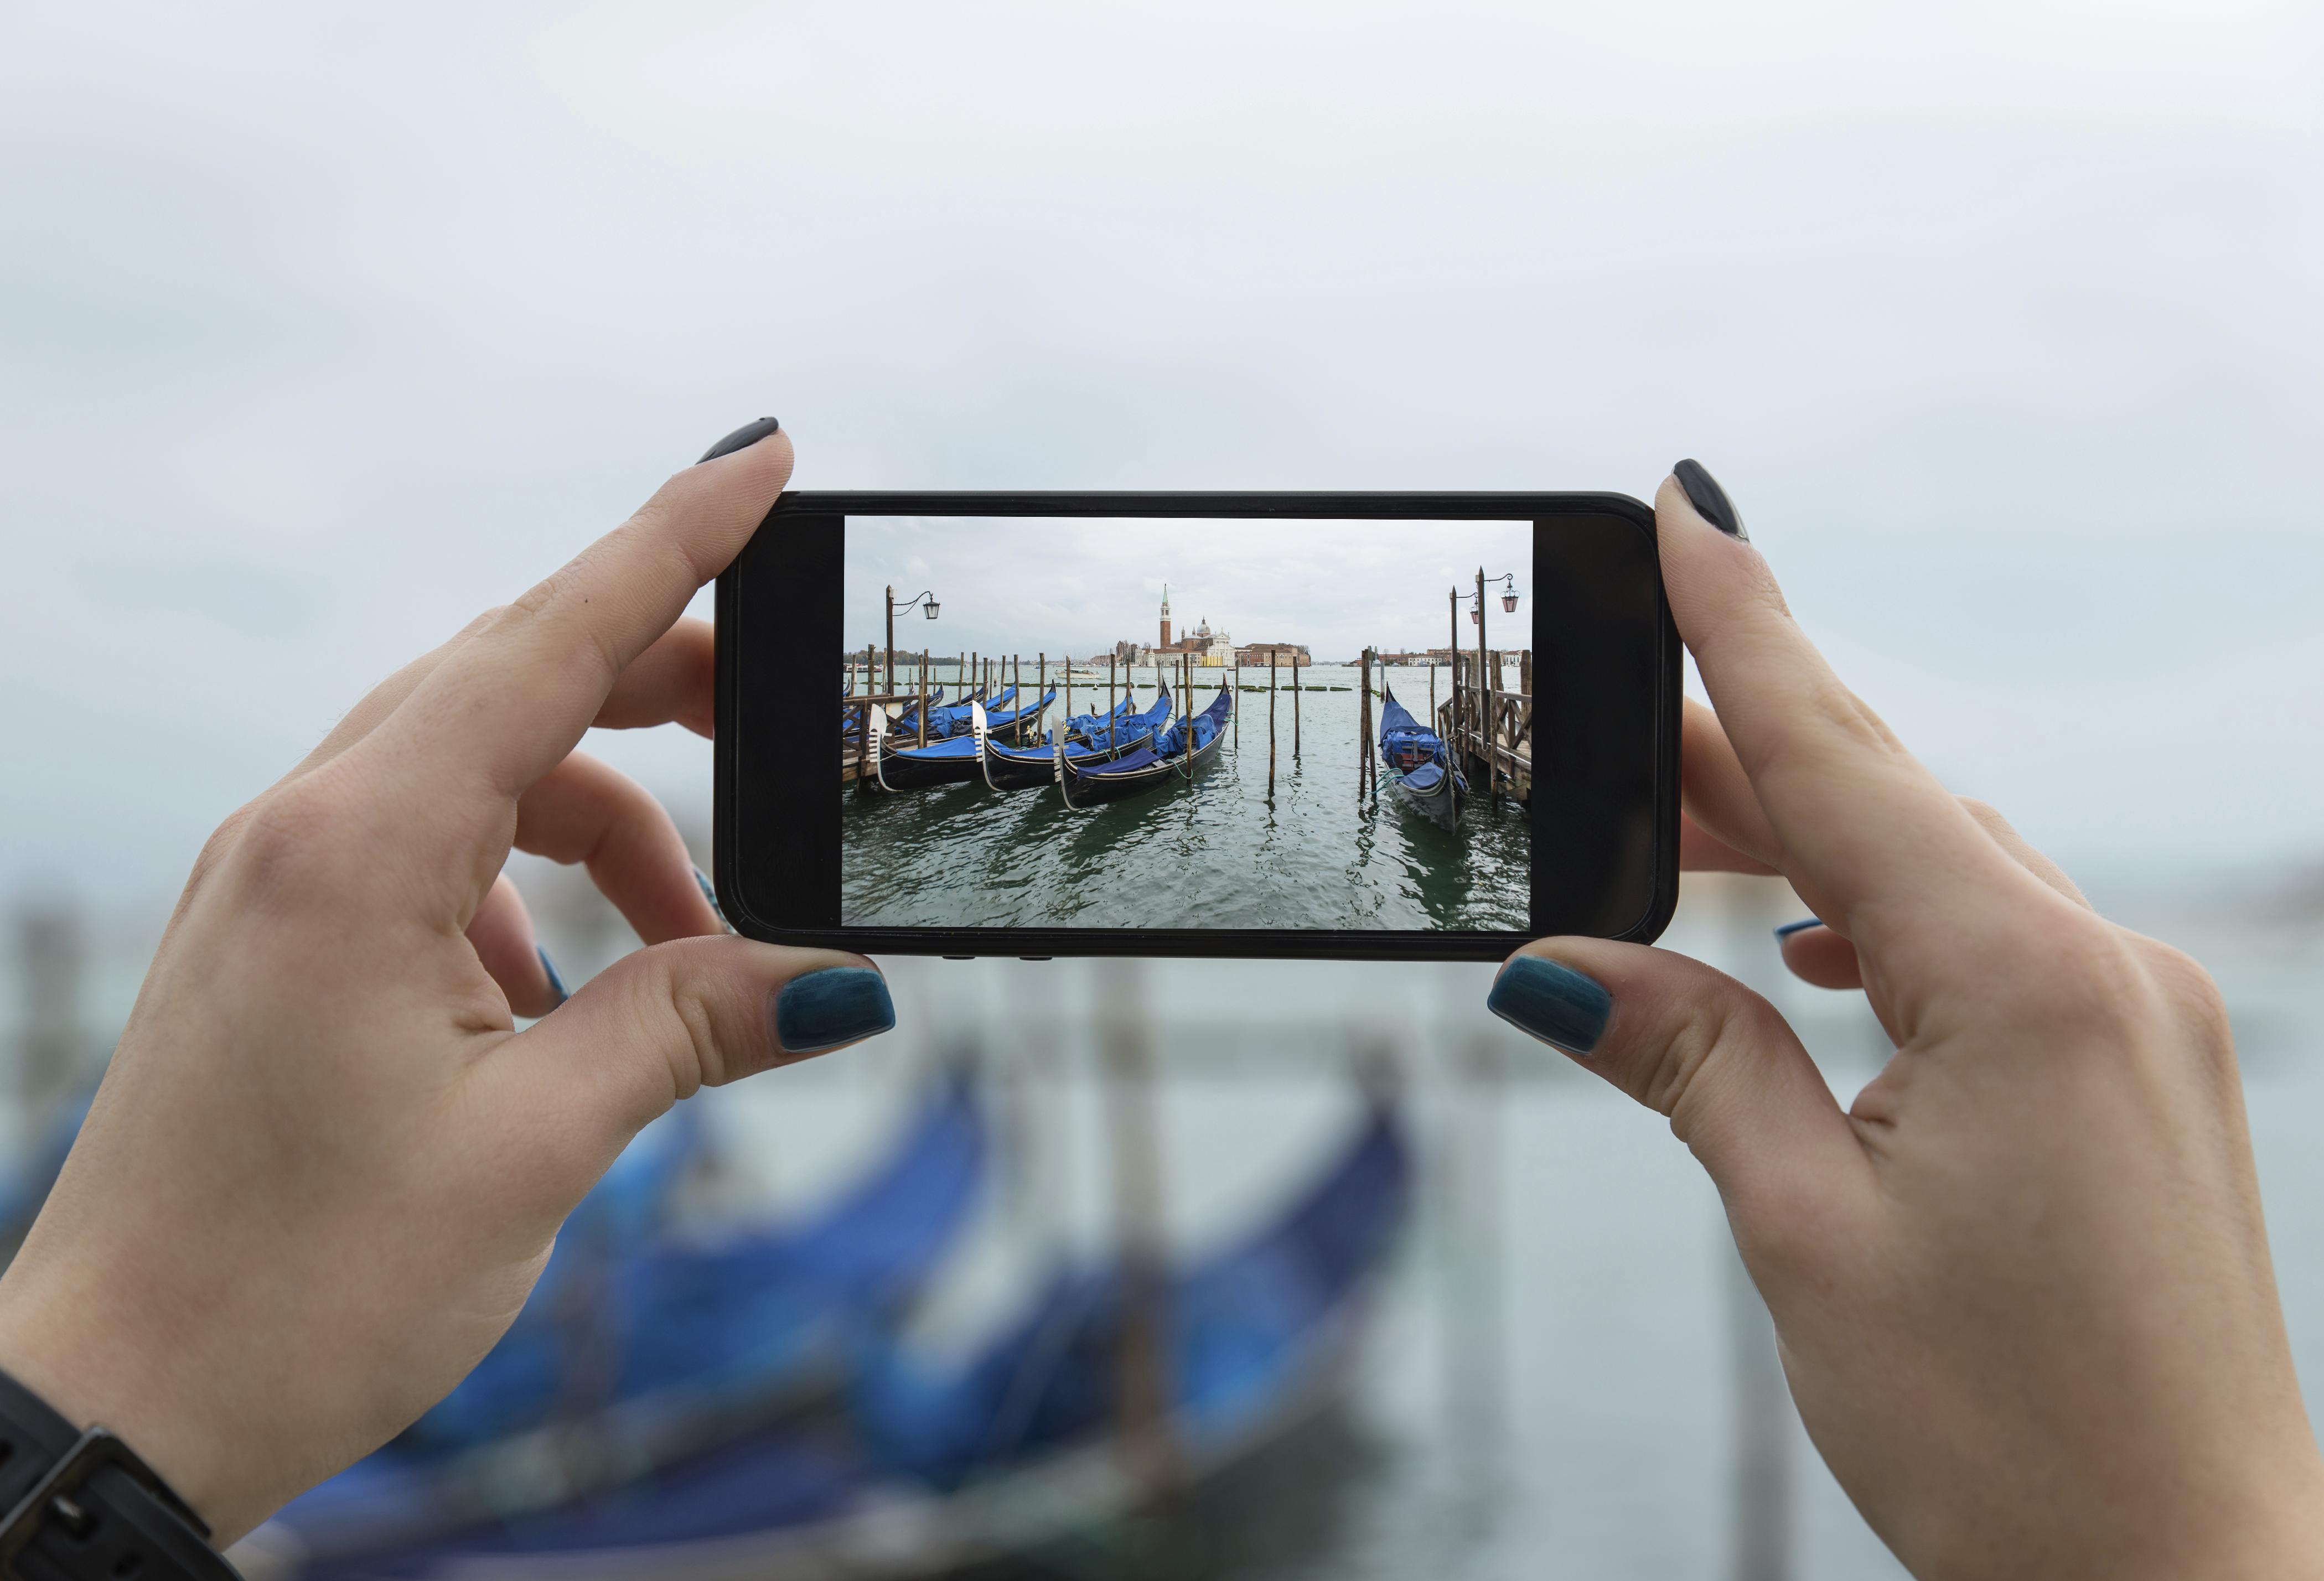 nasa using technology communication devices - photo #31